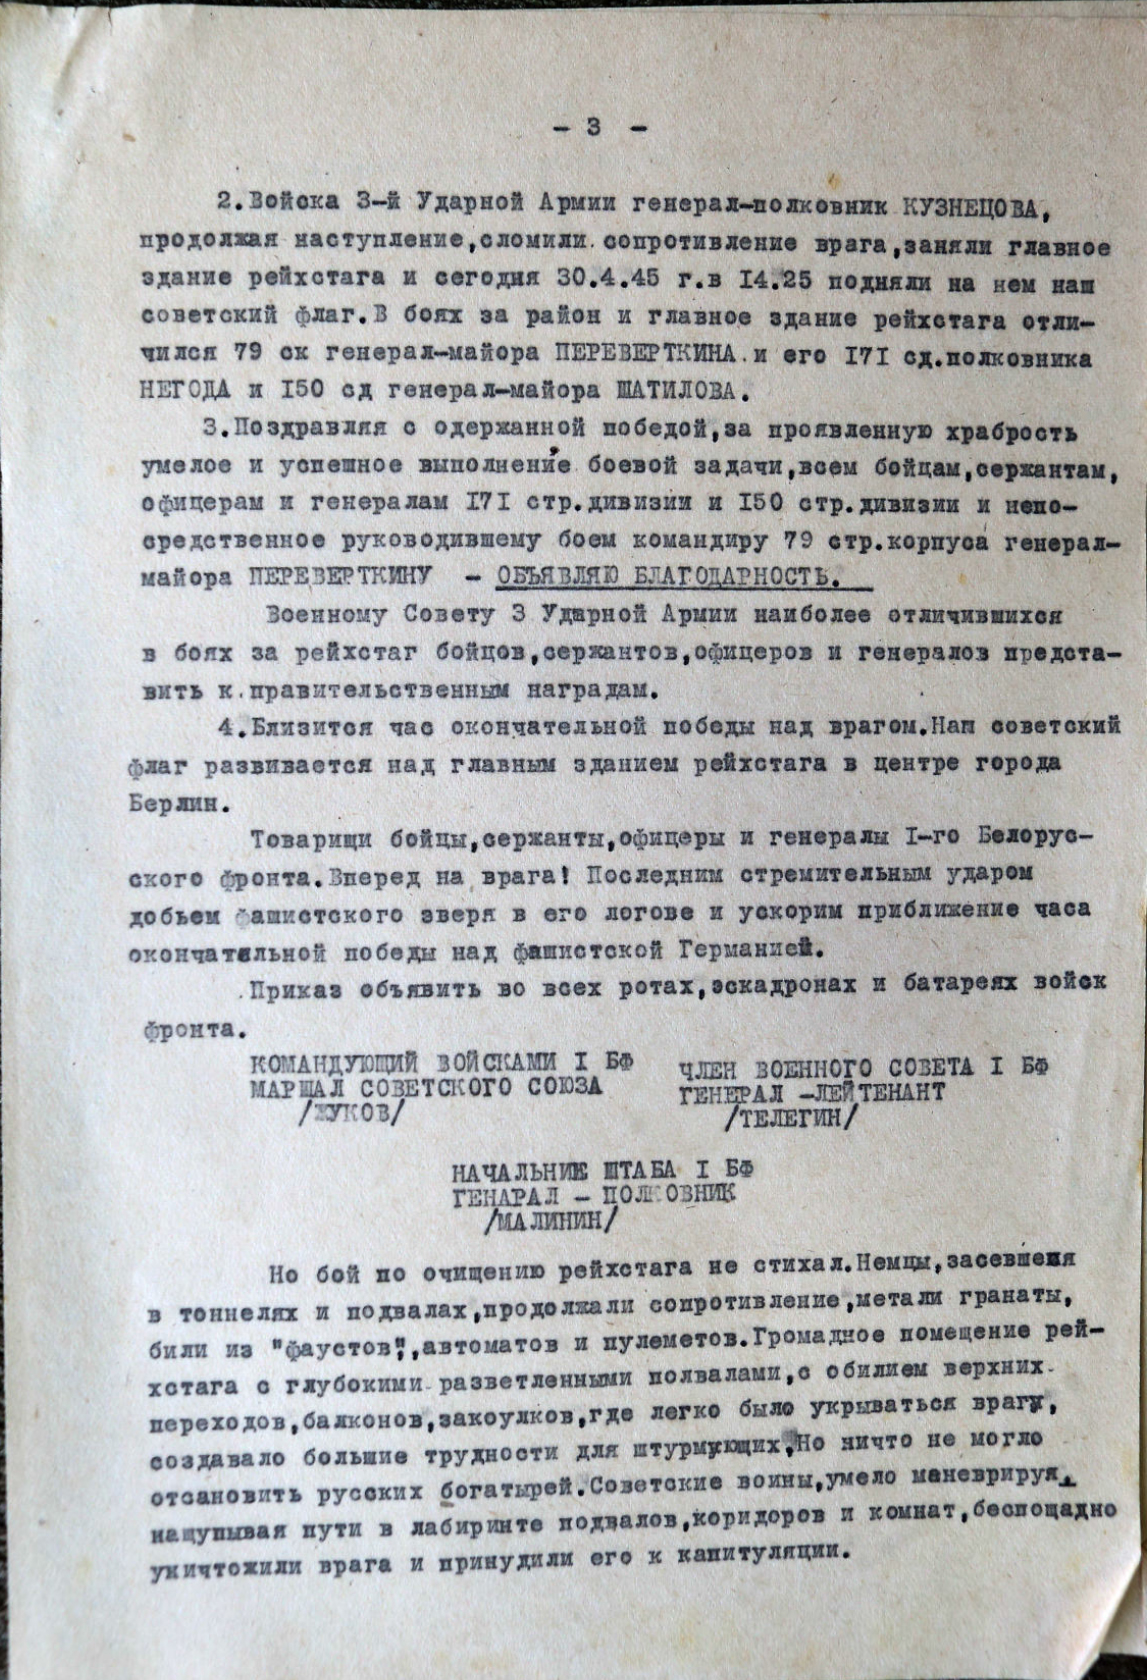 2. Боевая характеристика знамени военного совета 3УА, водружен. над рейхстагом-3.jpg